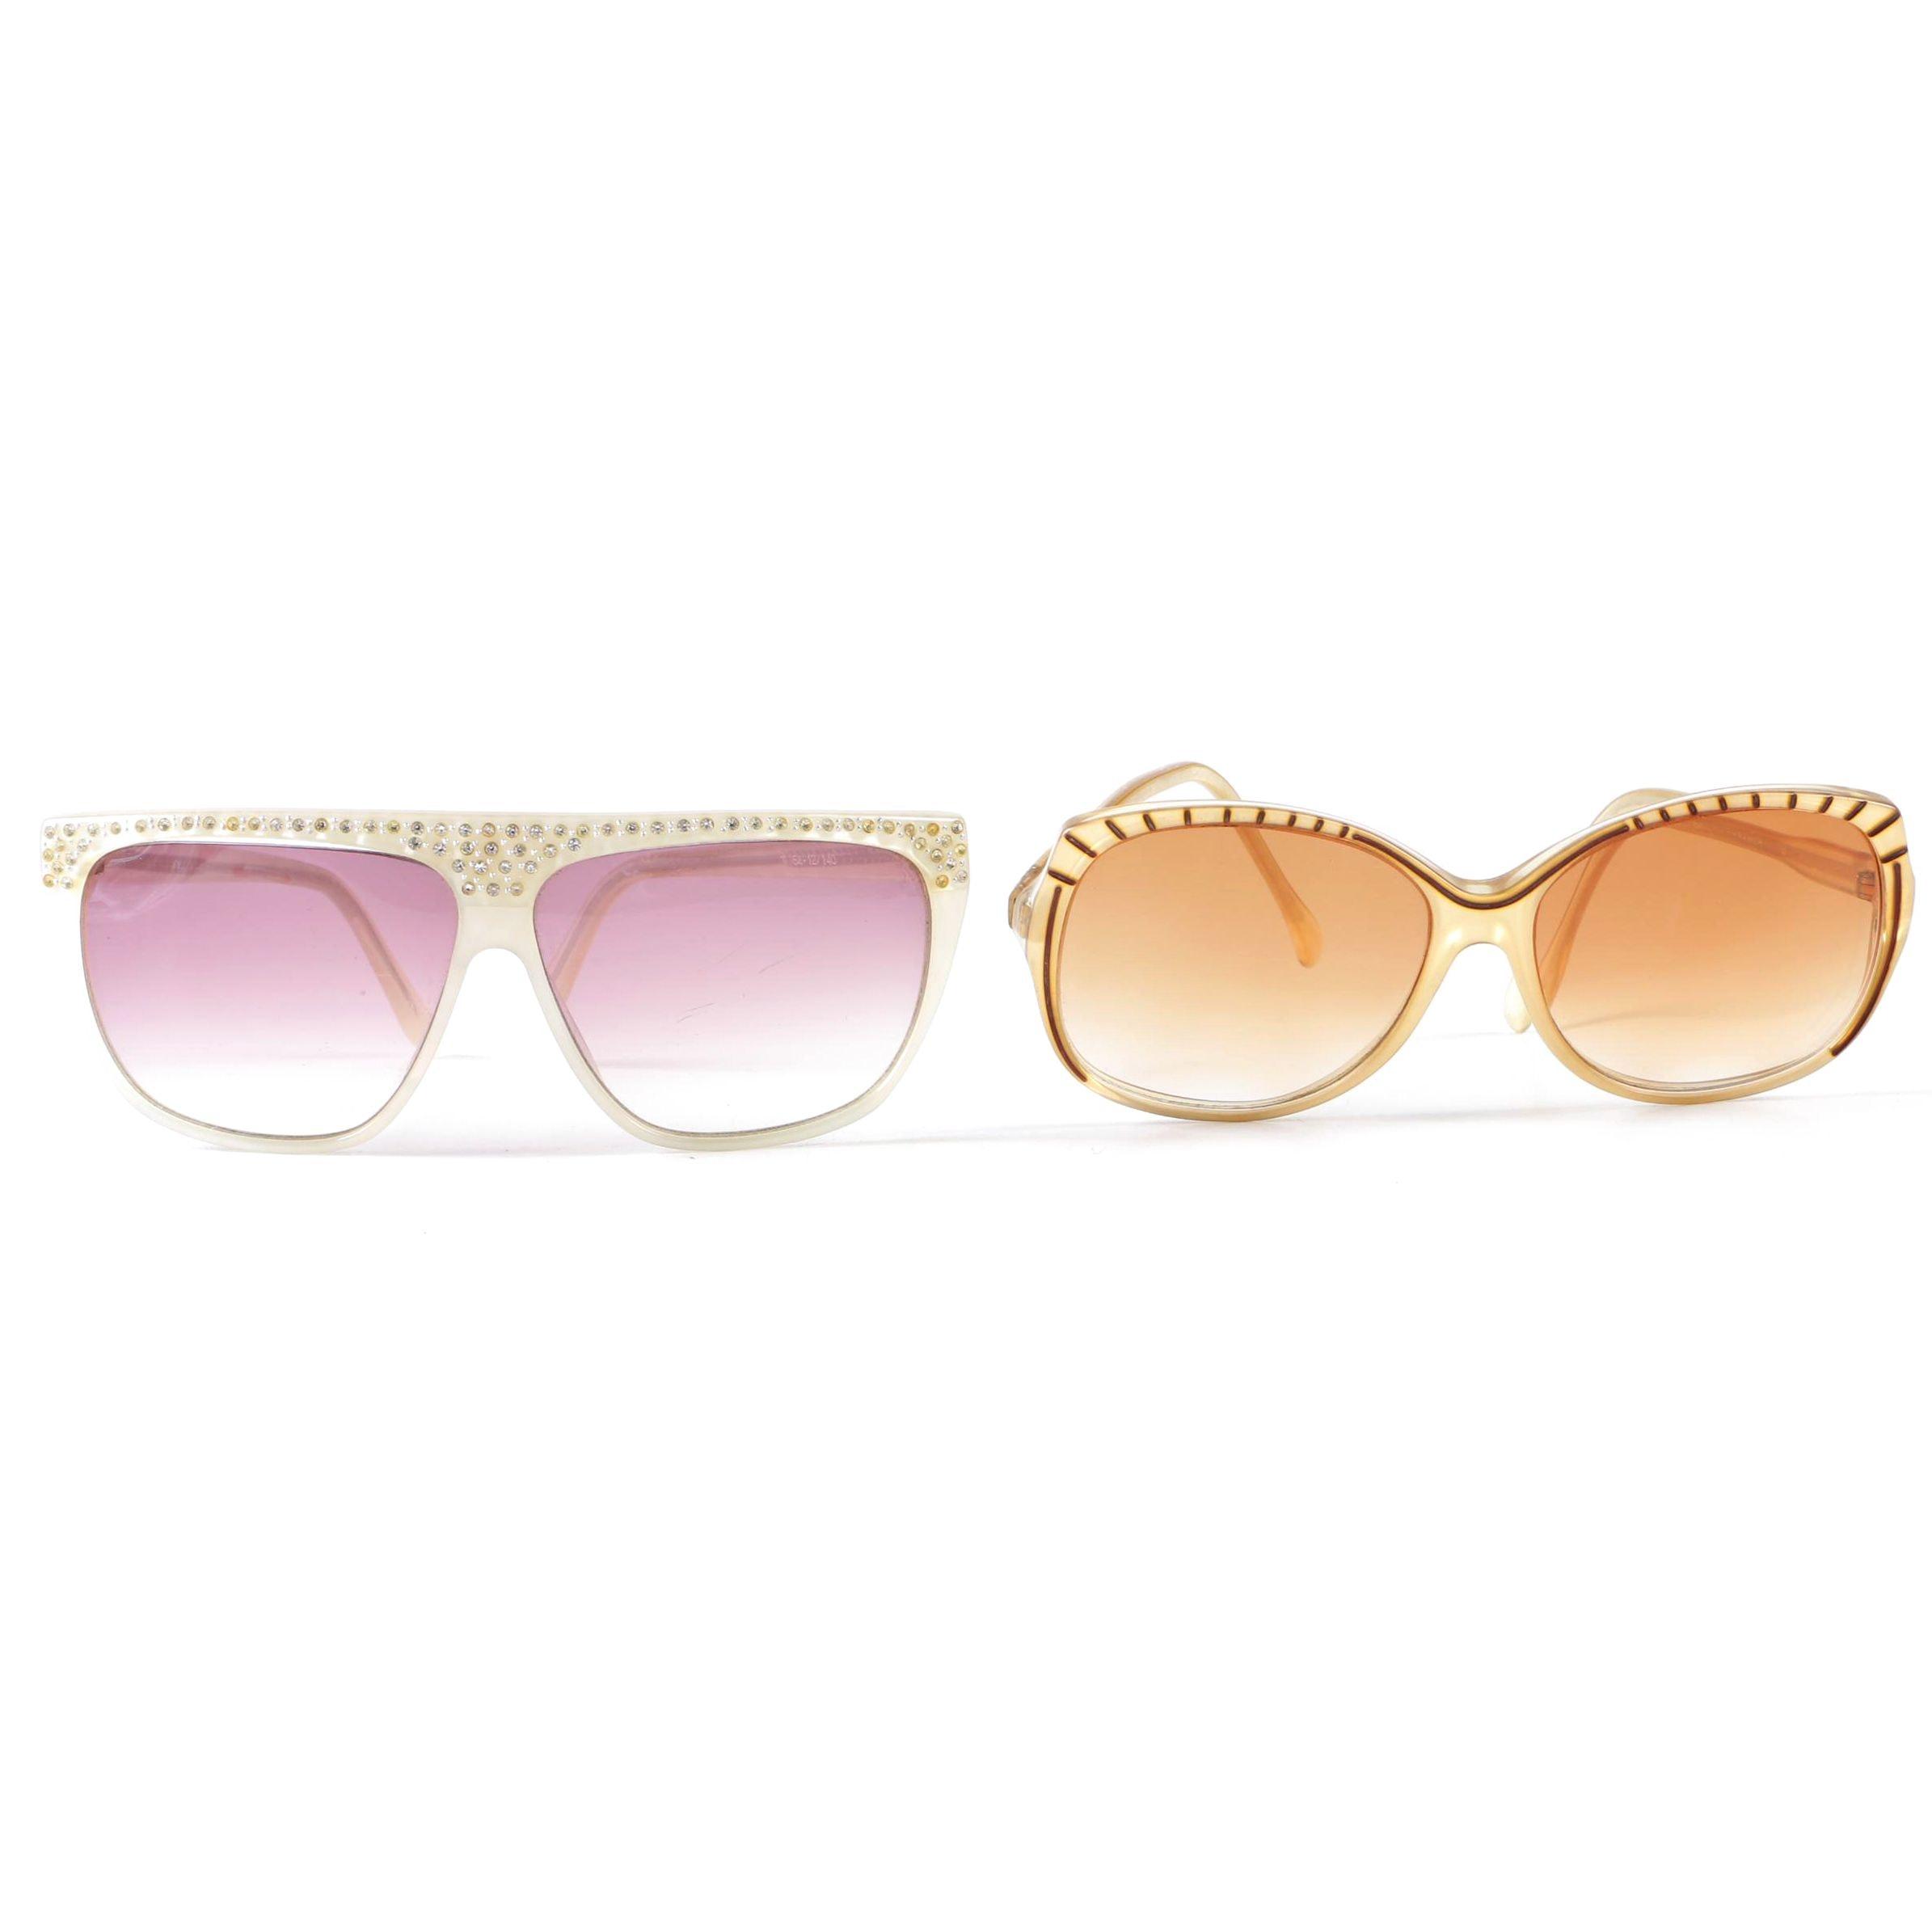 Oversized Sunglasses Including Nina Ricci Paris, Vintage